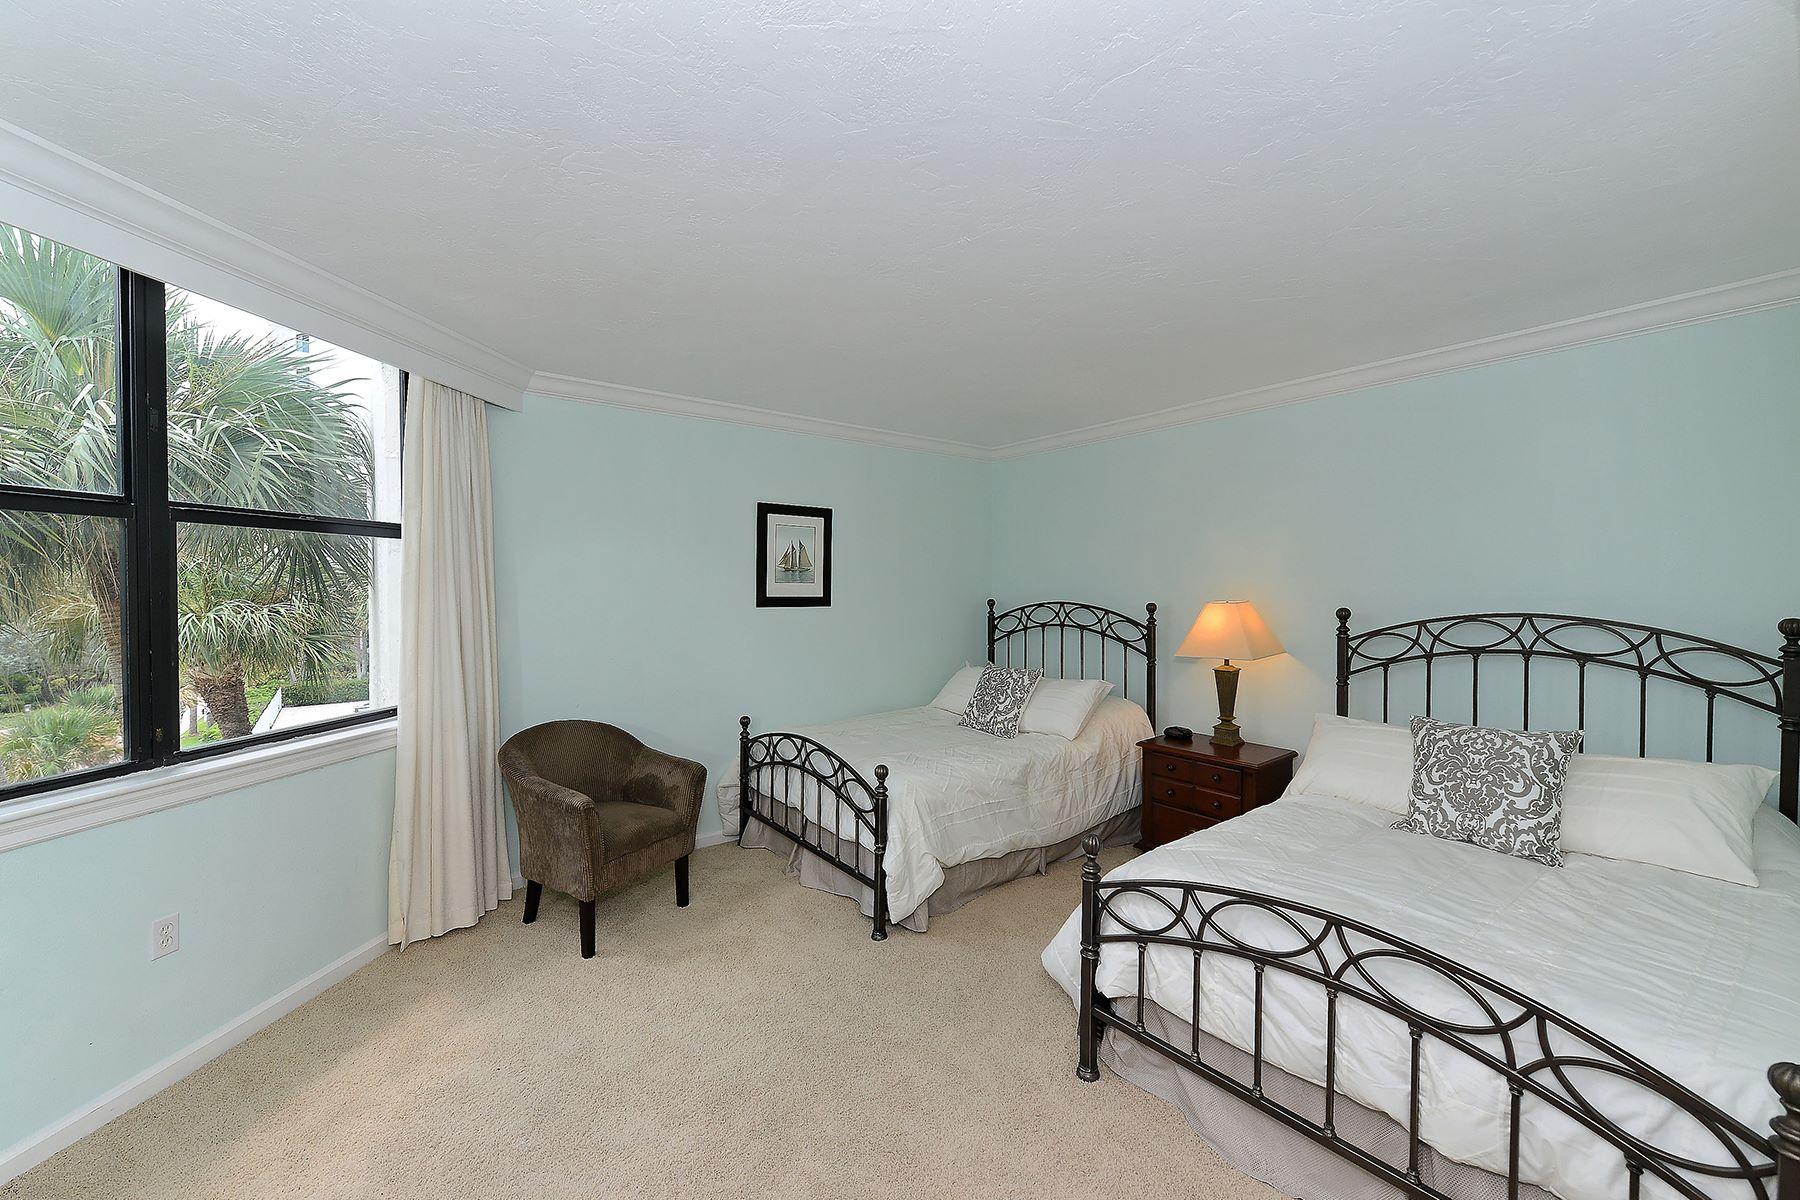 Additional photo for property listing at LONGBOAT KEY 1050  Longboat Club Rd 303,  长船礁, 佛罗里达州 34228 美国